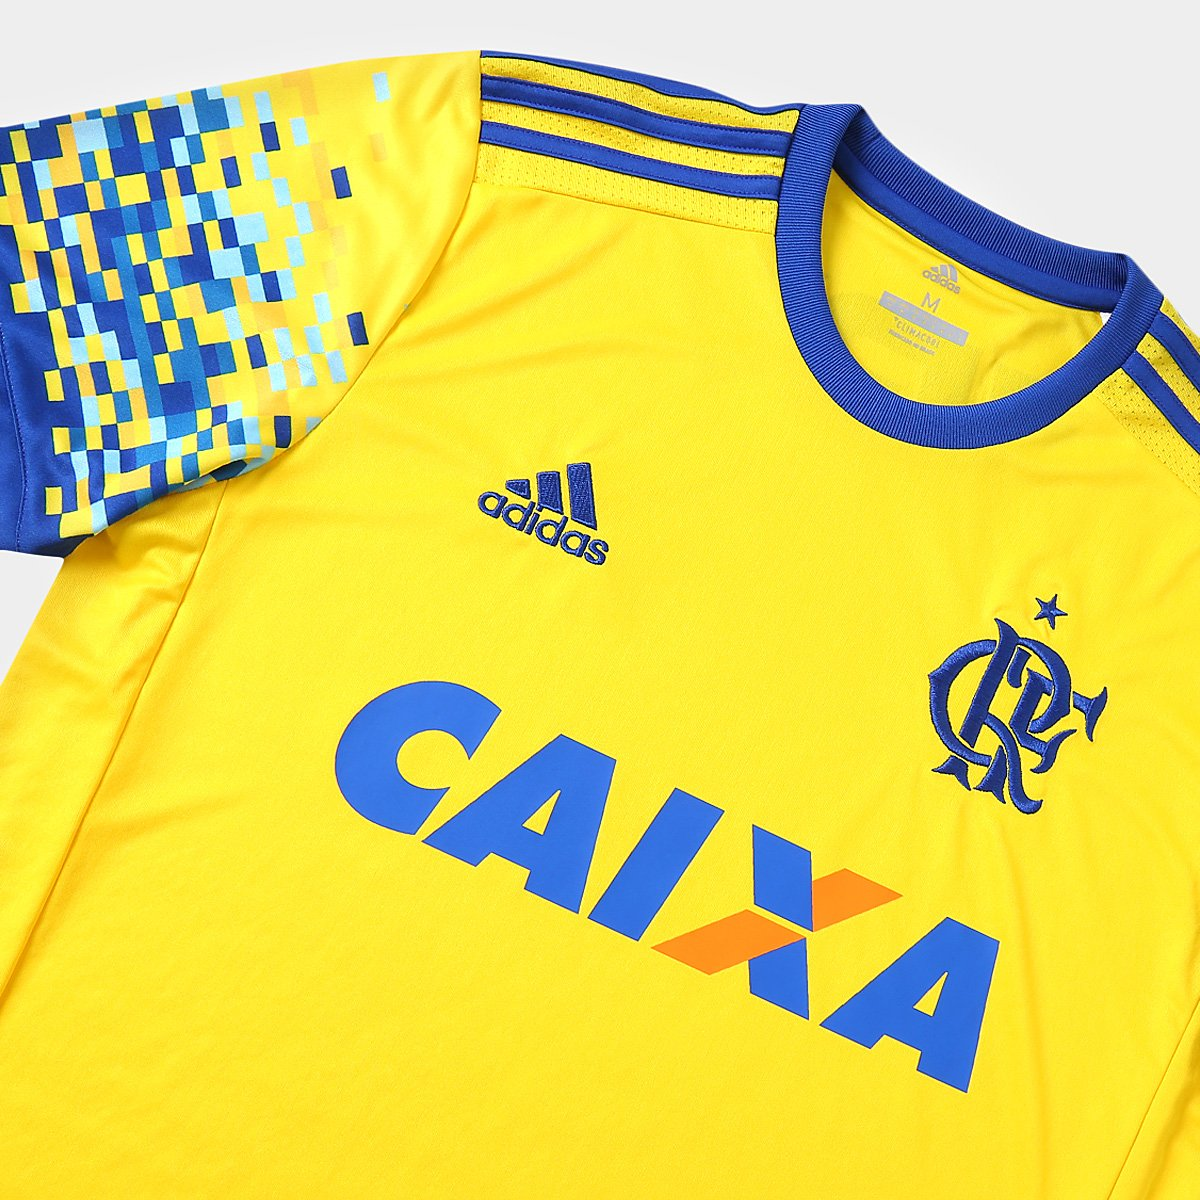 a9d0cffb122 Camisa Flamengo III 17 18 s nº Torcedor Adidas Masculina - Shopping ...